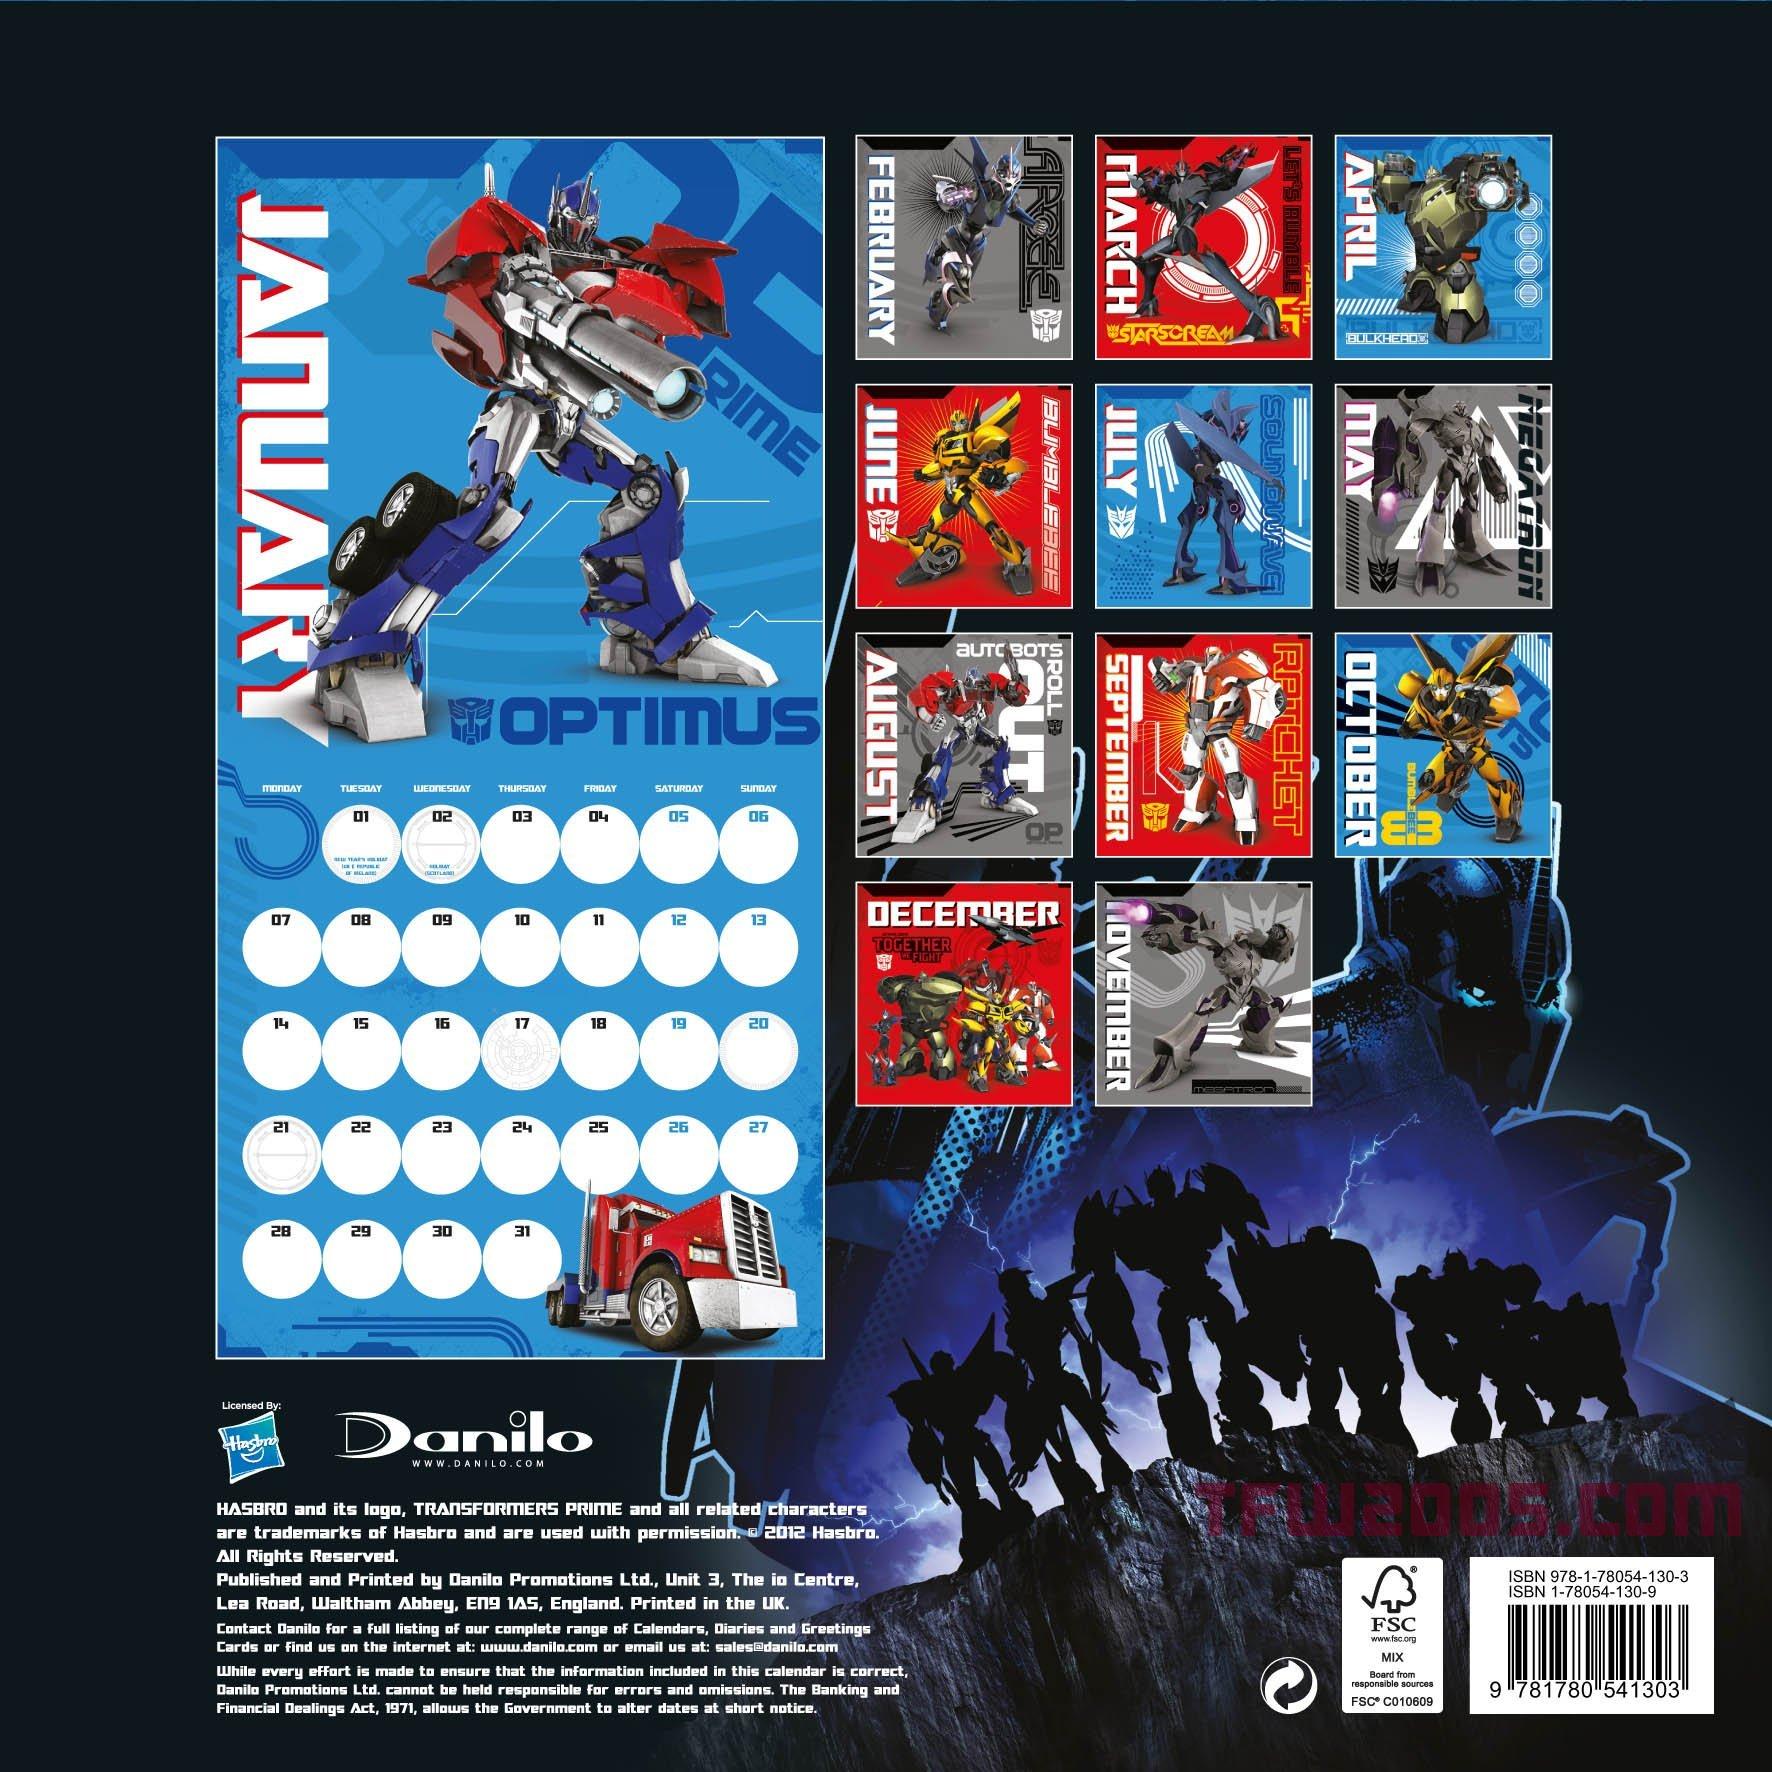 transformers prime 2013 licensed merchandise calendar